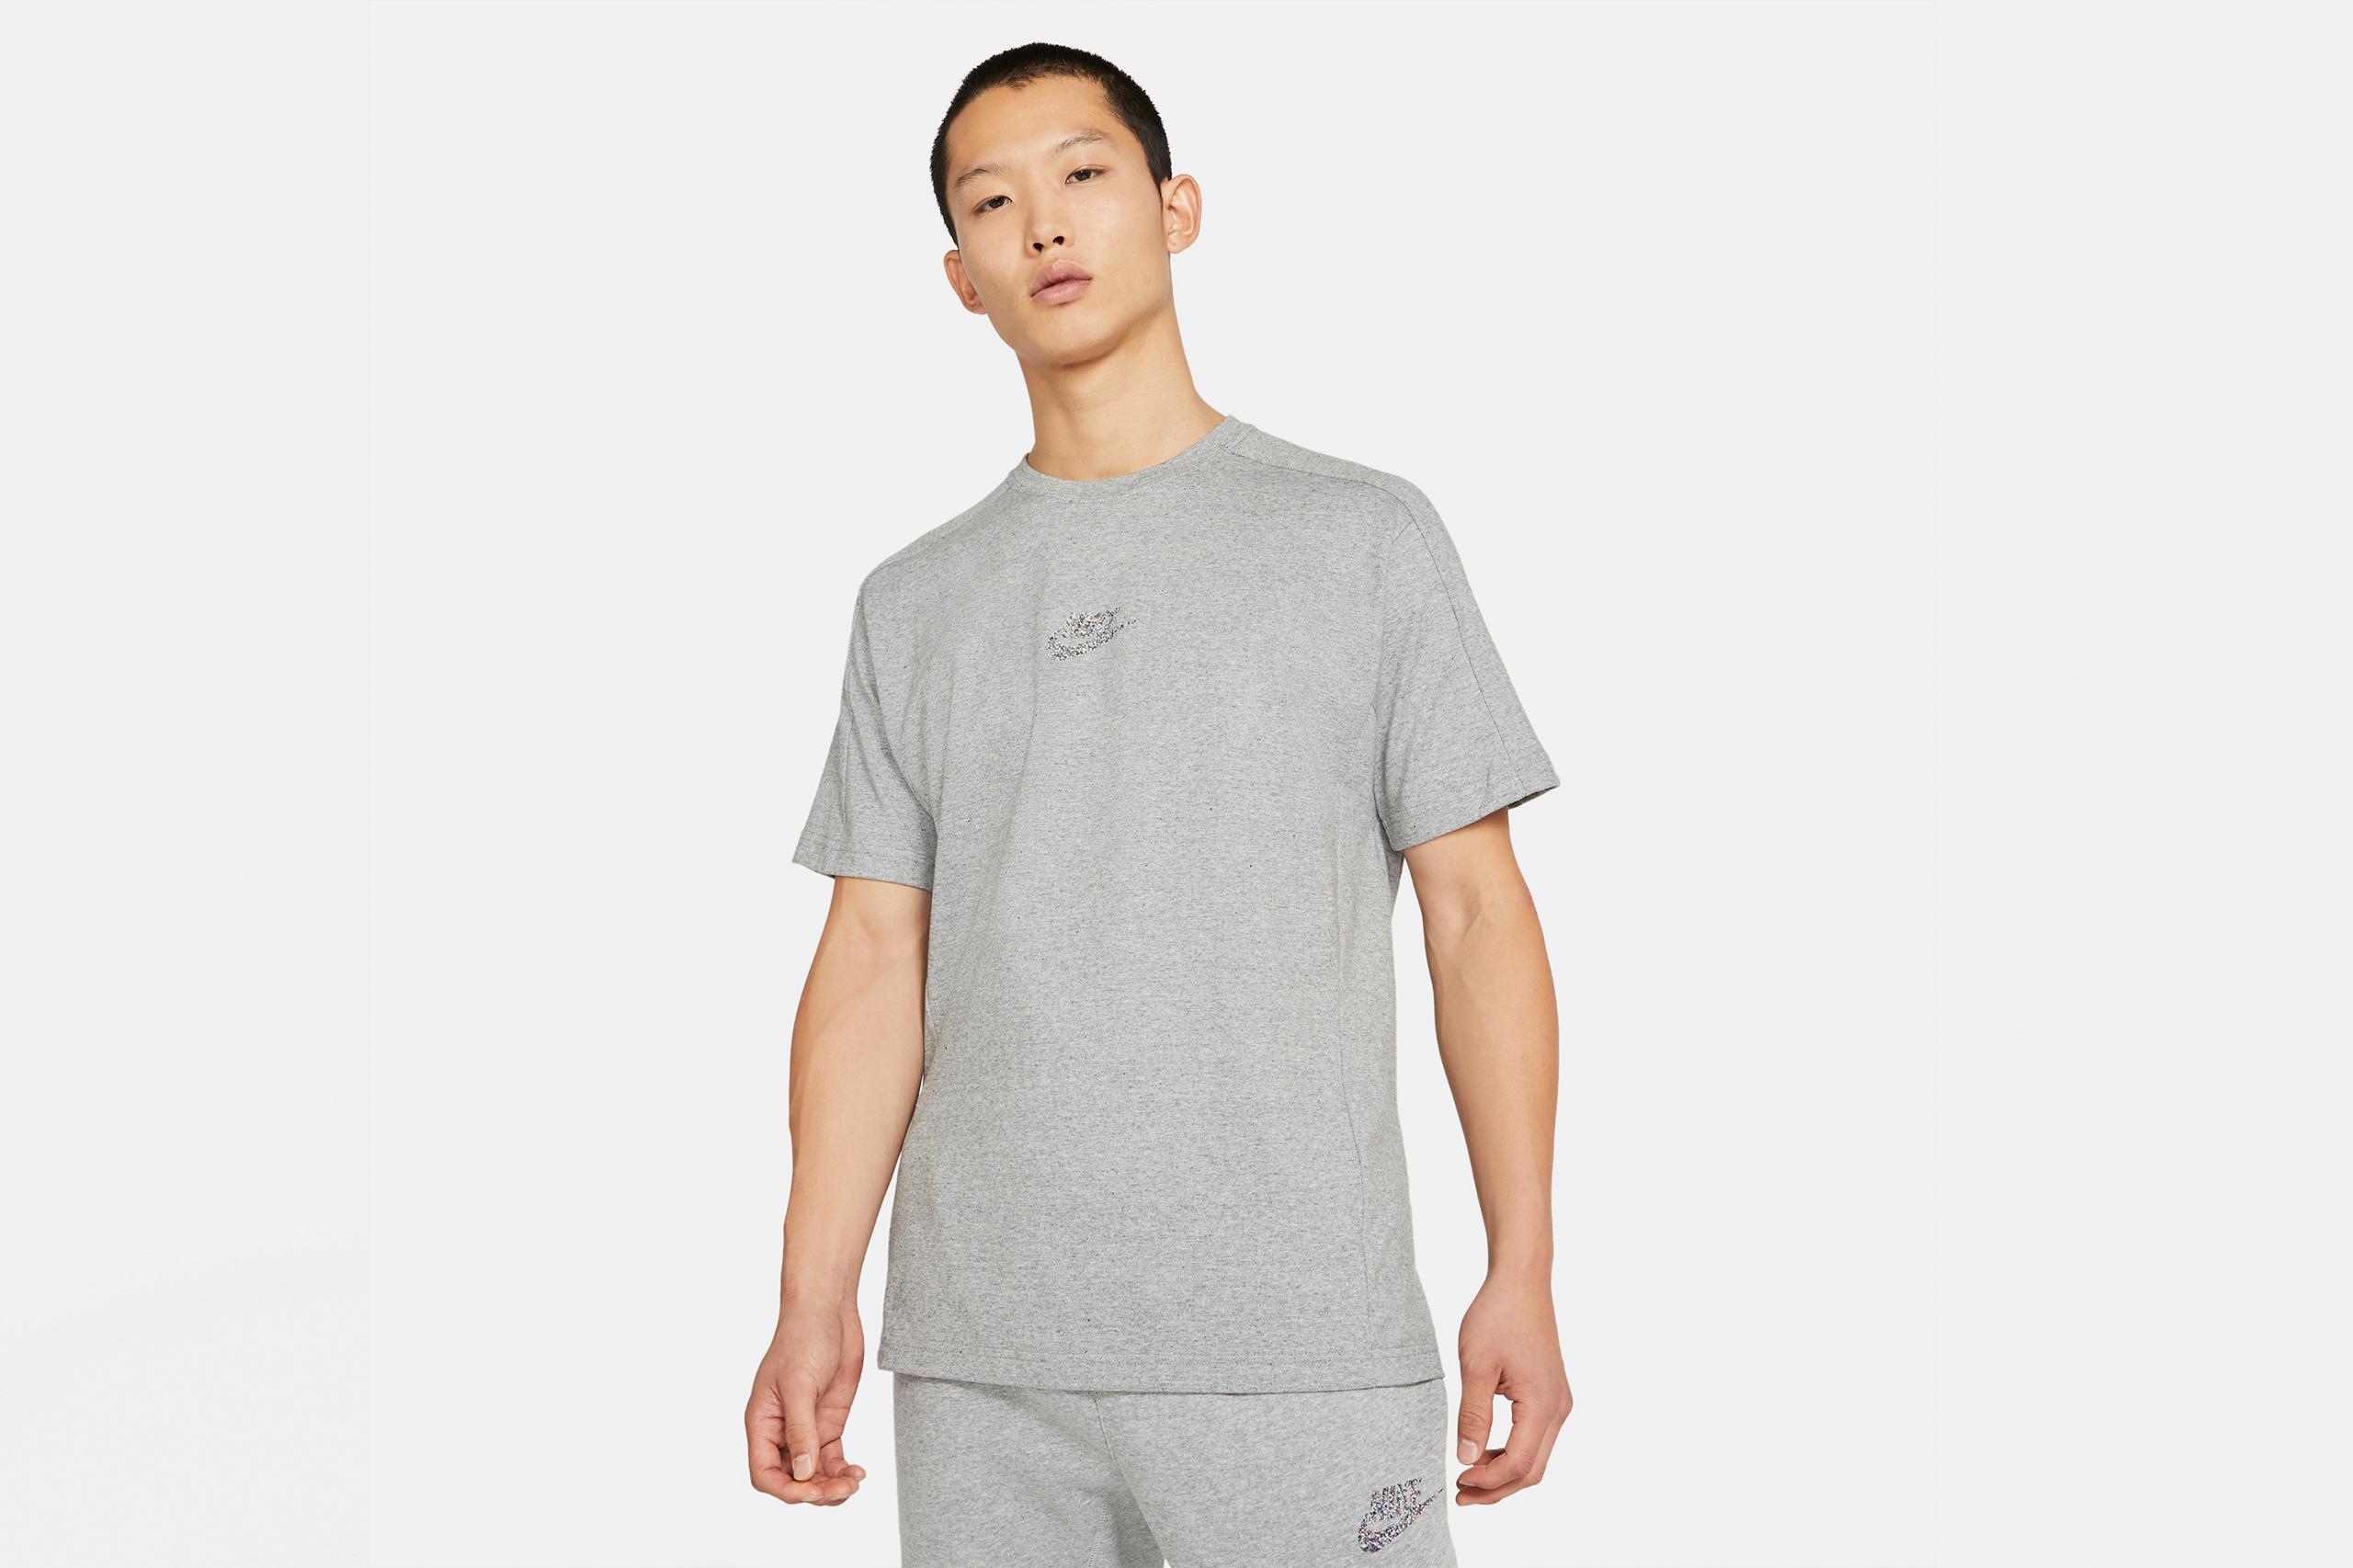 Nike Short Sleeve Jersey Top Revival Black/Heather